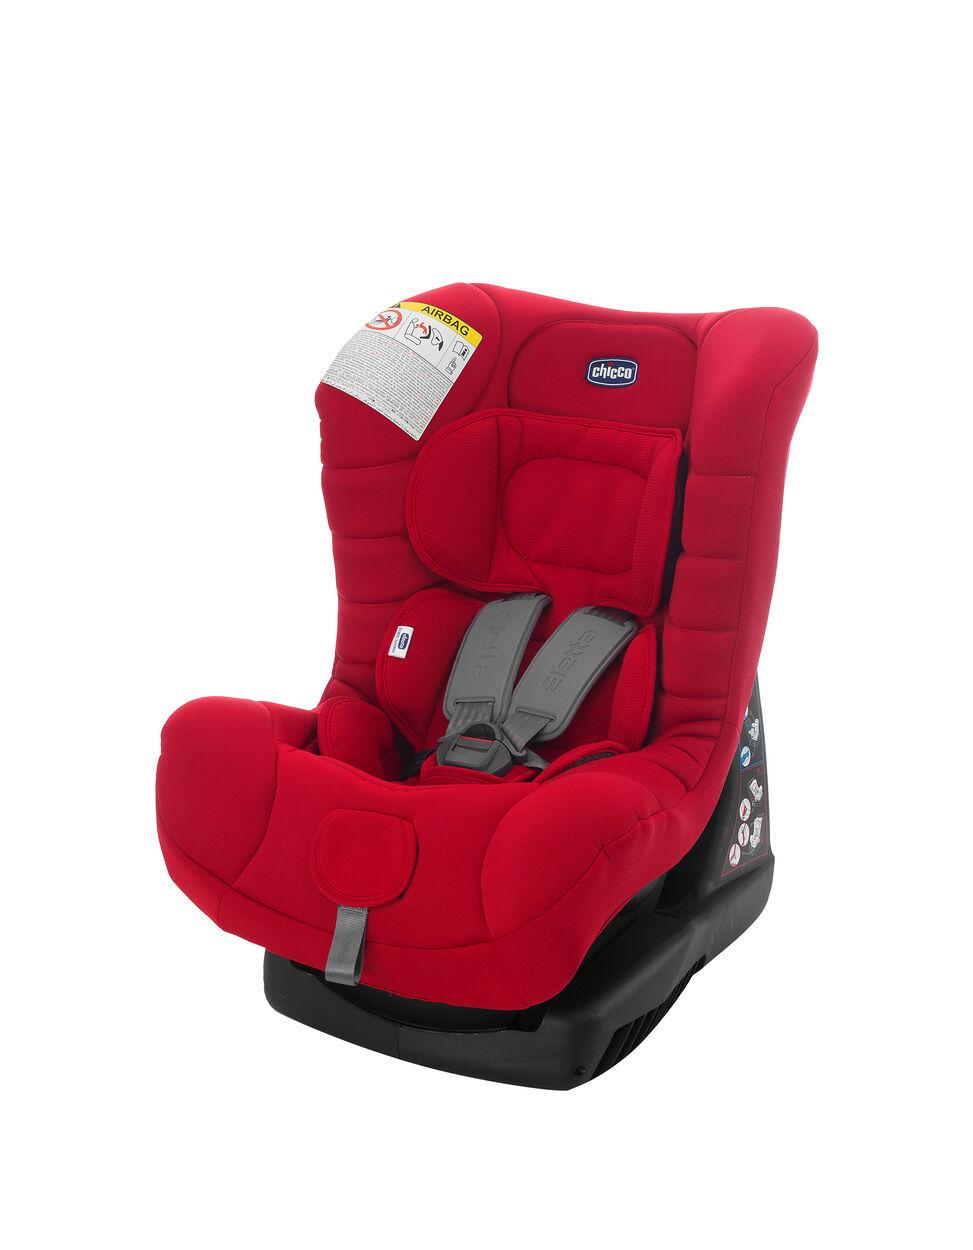 Cadeira Auto Gr 0+/1 Eletta Comfort Chicco